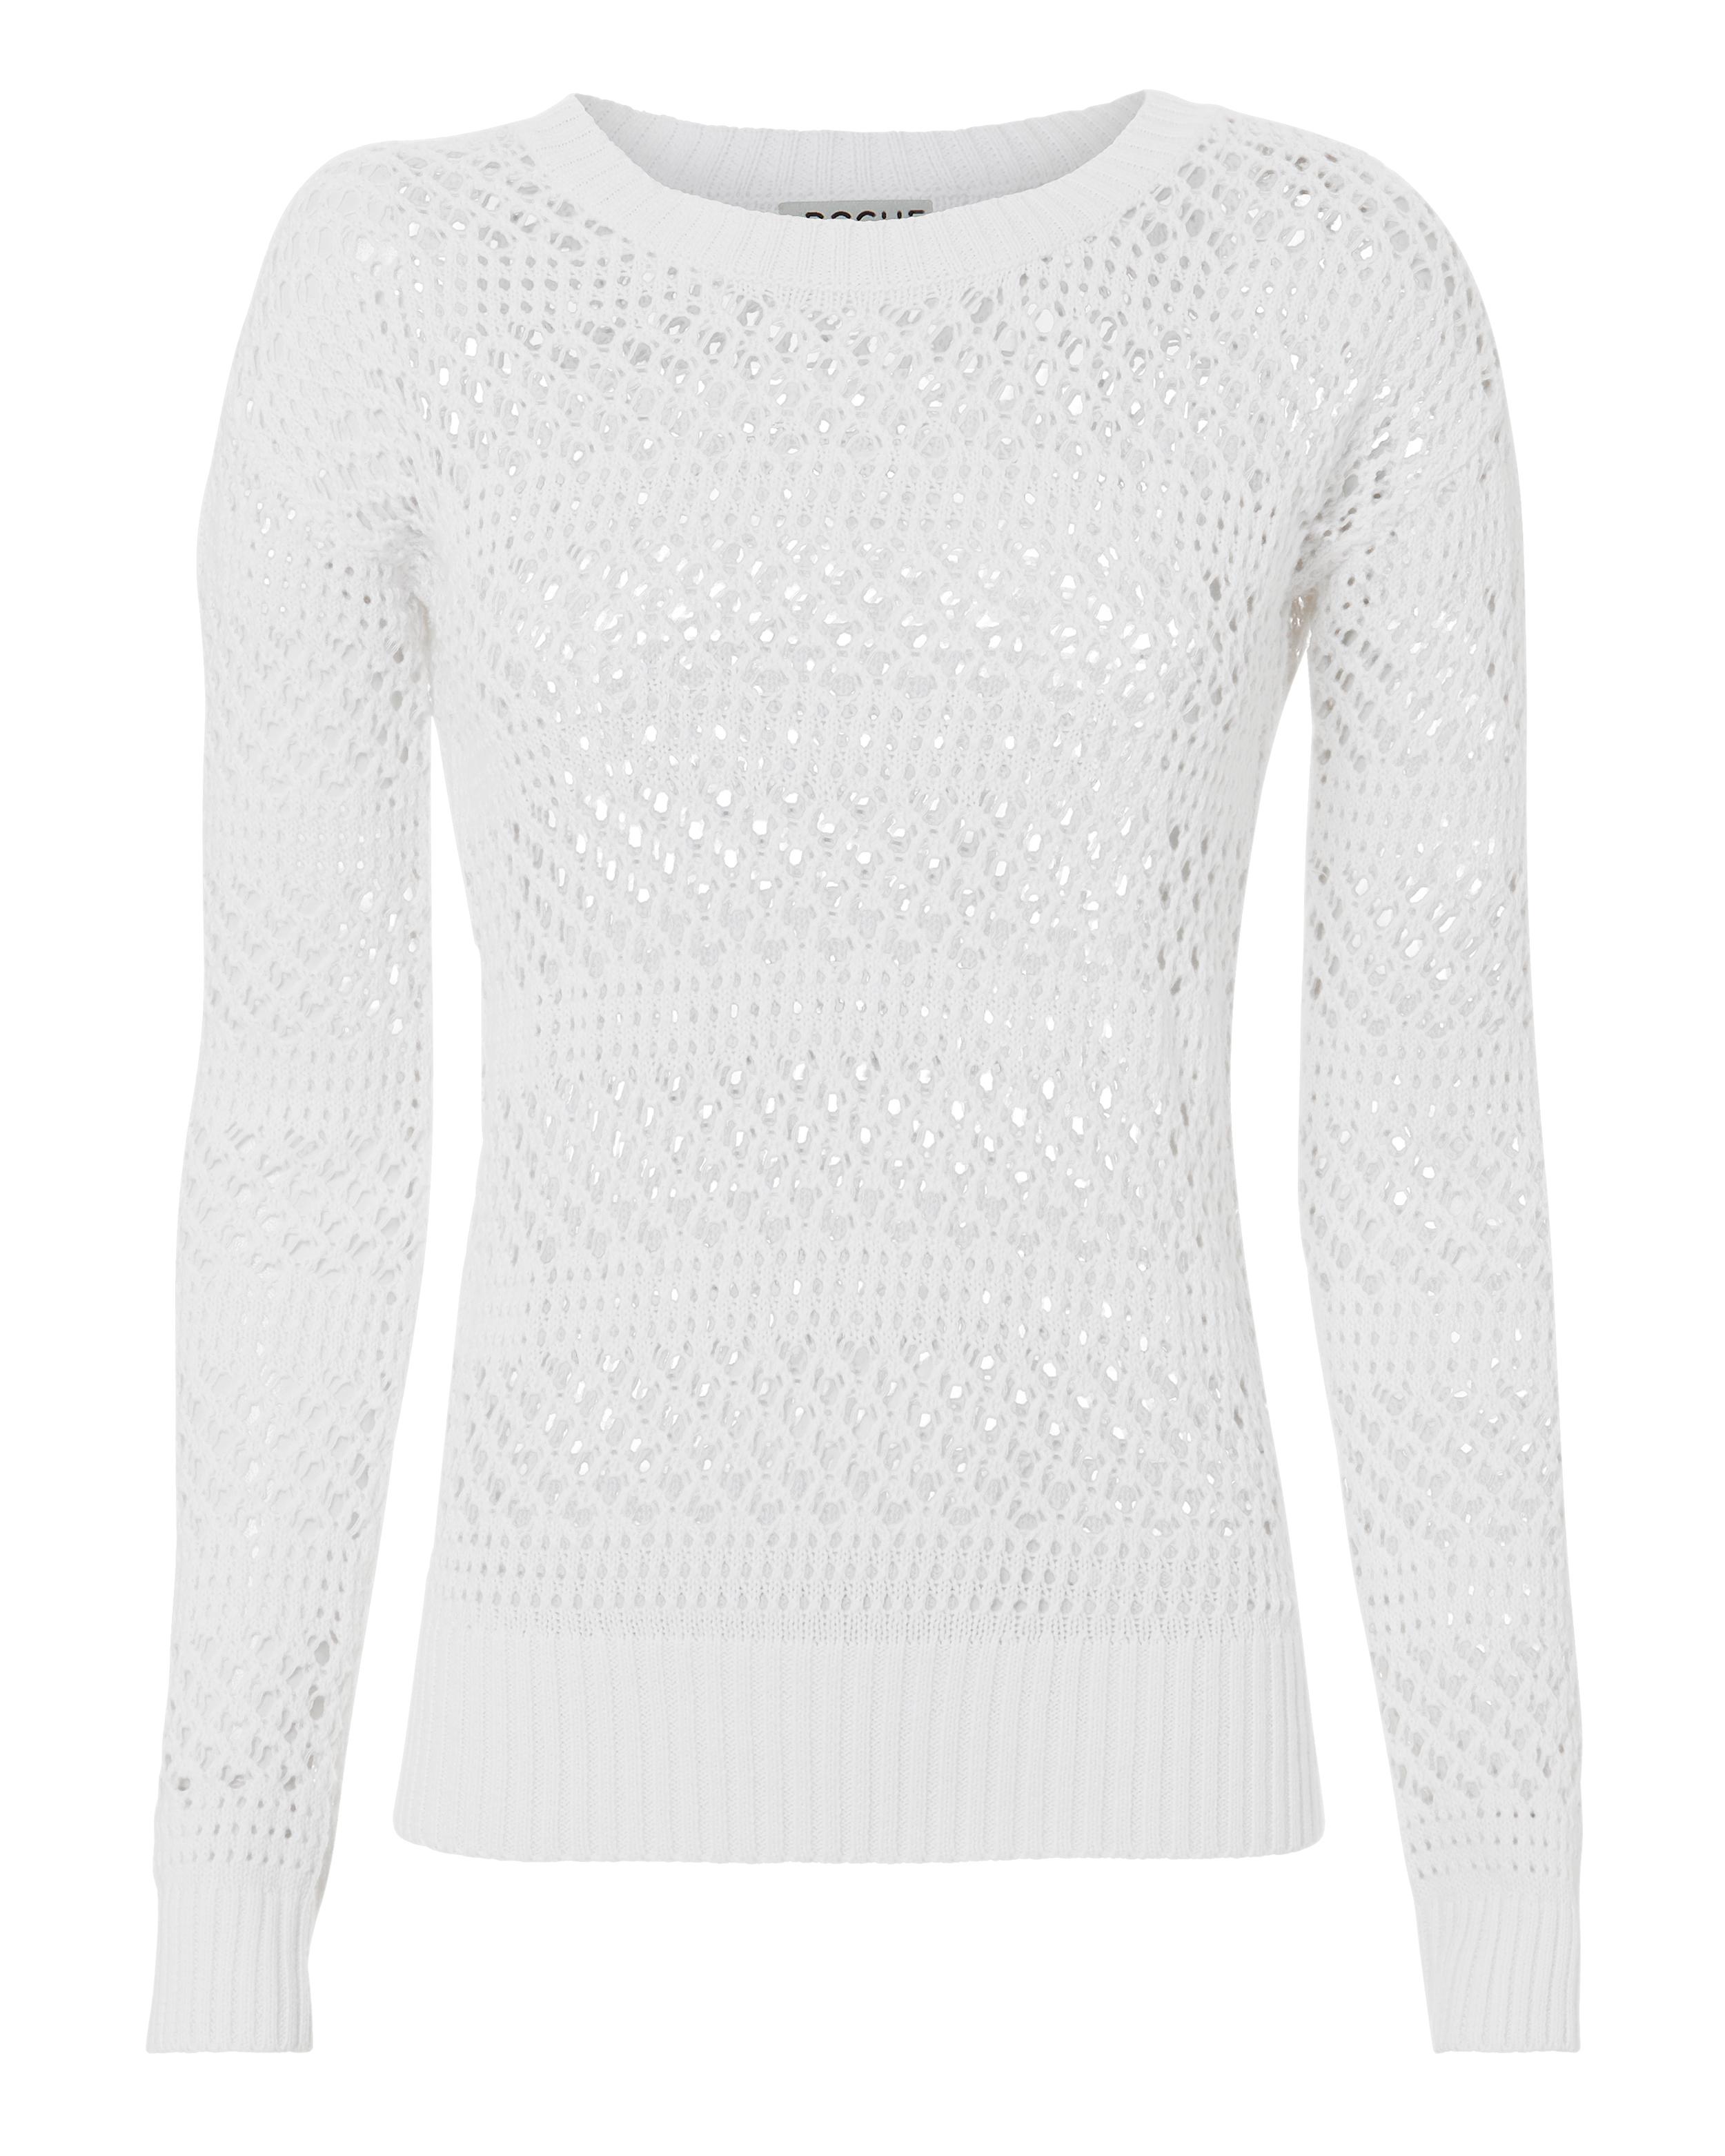 ST. ROCHE Natalia Open Knit White Sweater